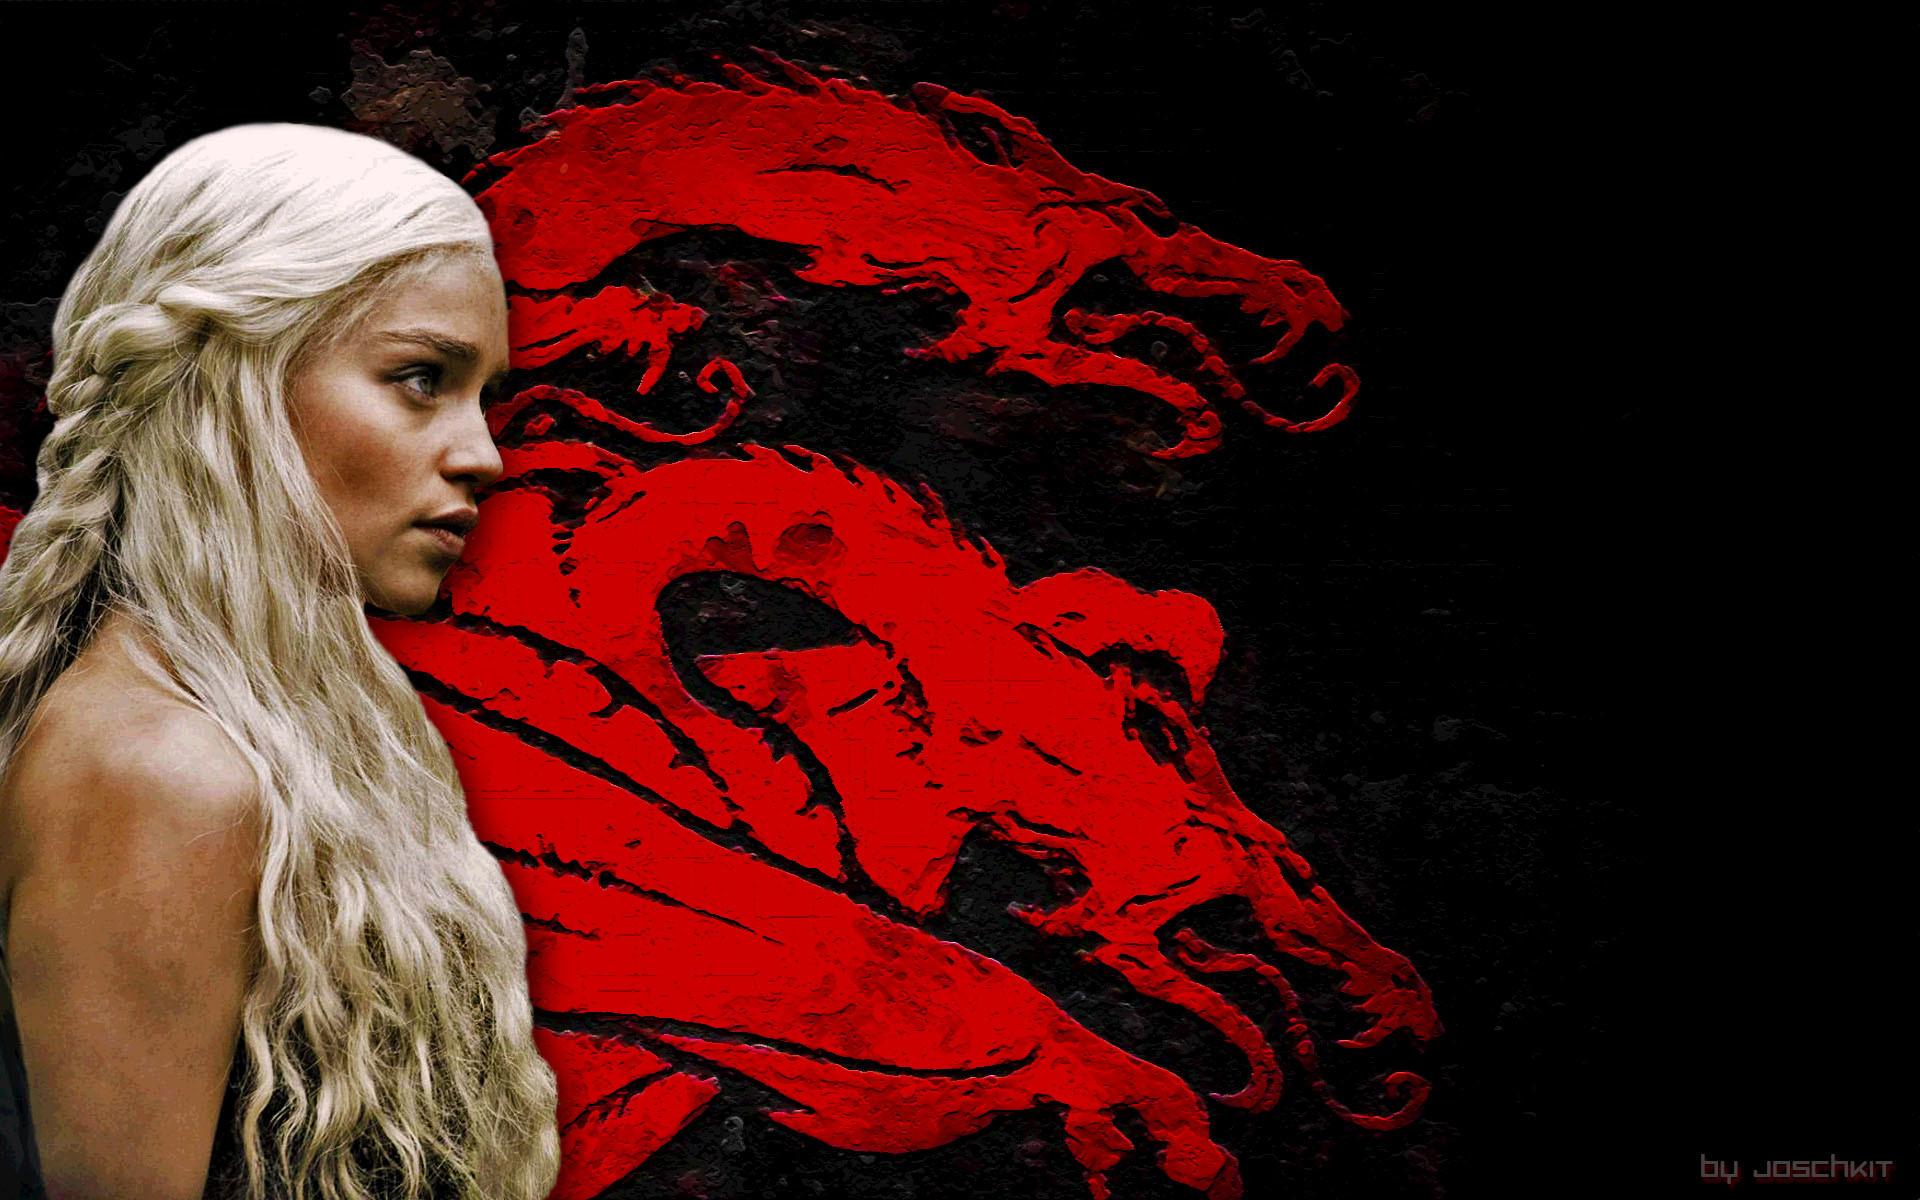 Daenerys Targaryen Hd Wallpaper 69 Images